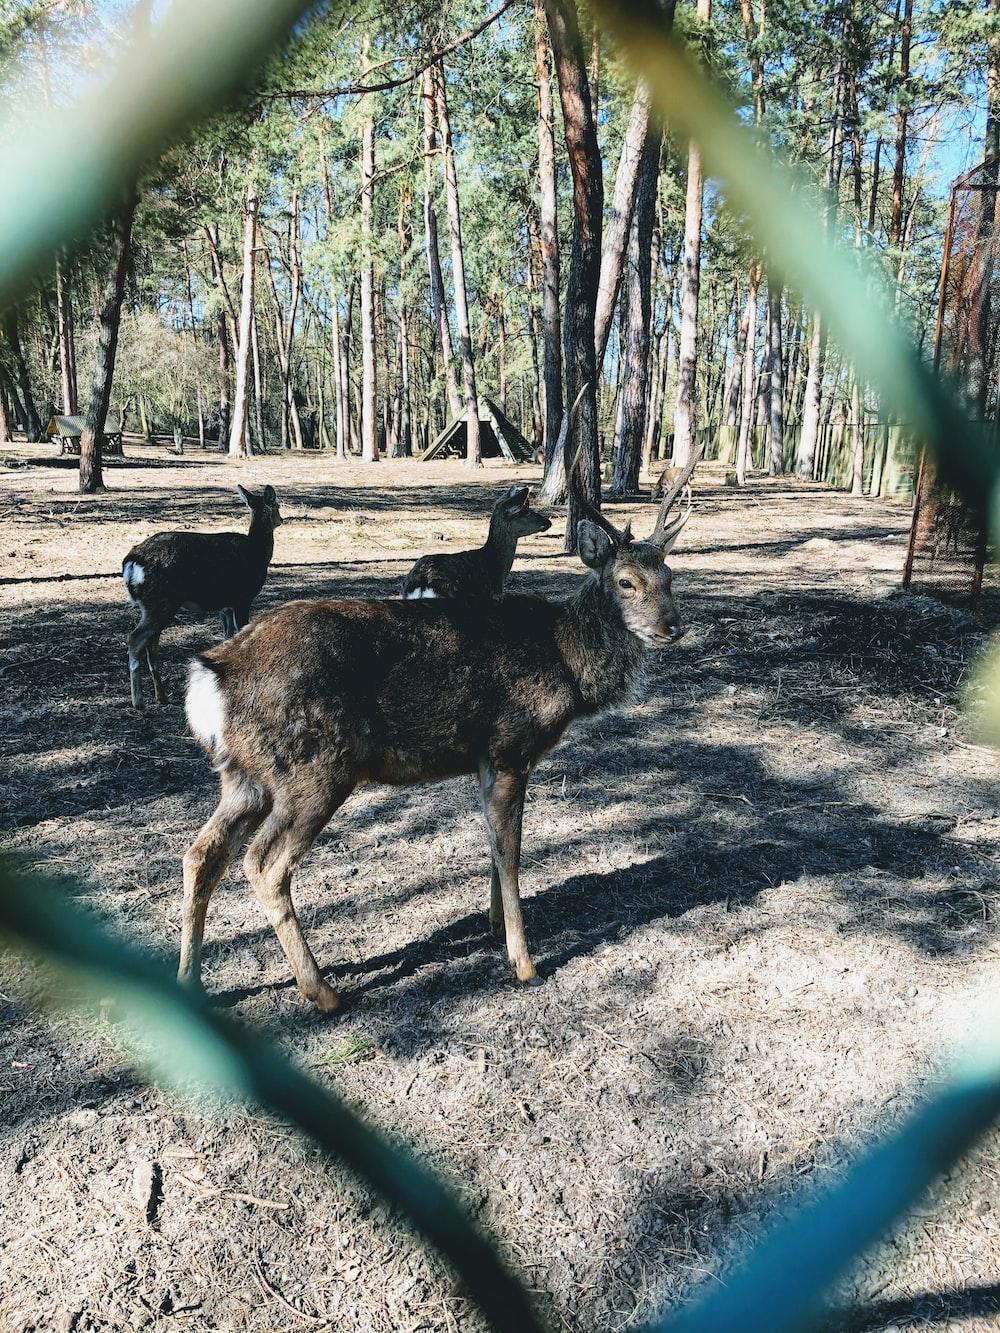 brown and black deer standing on brown soil during daytime